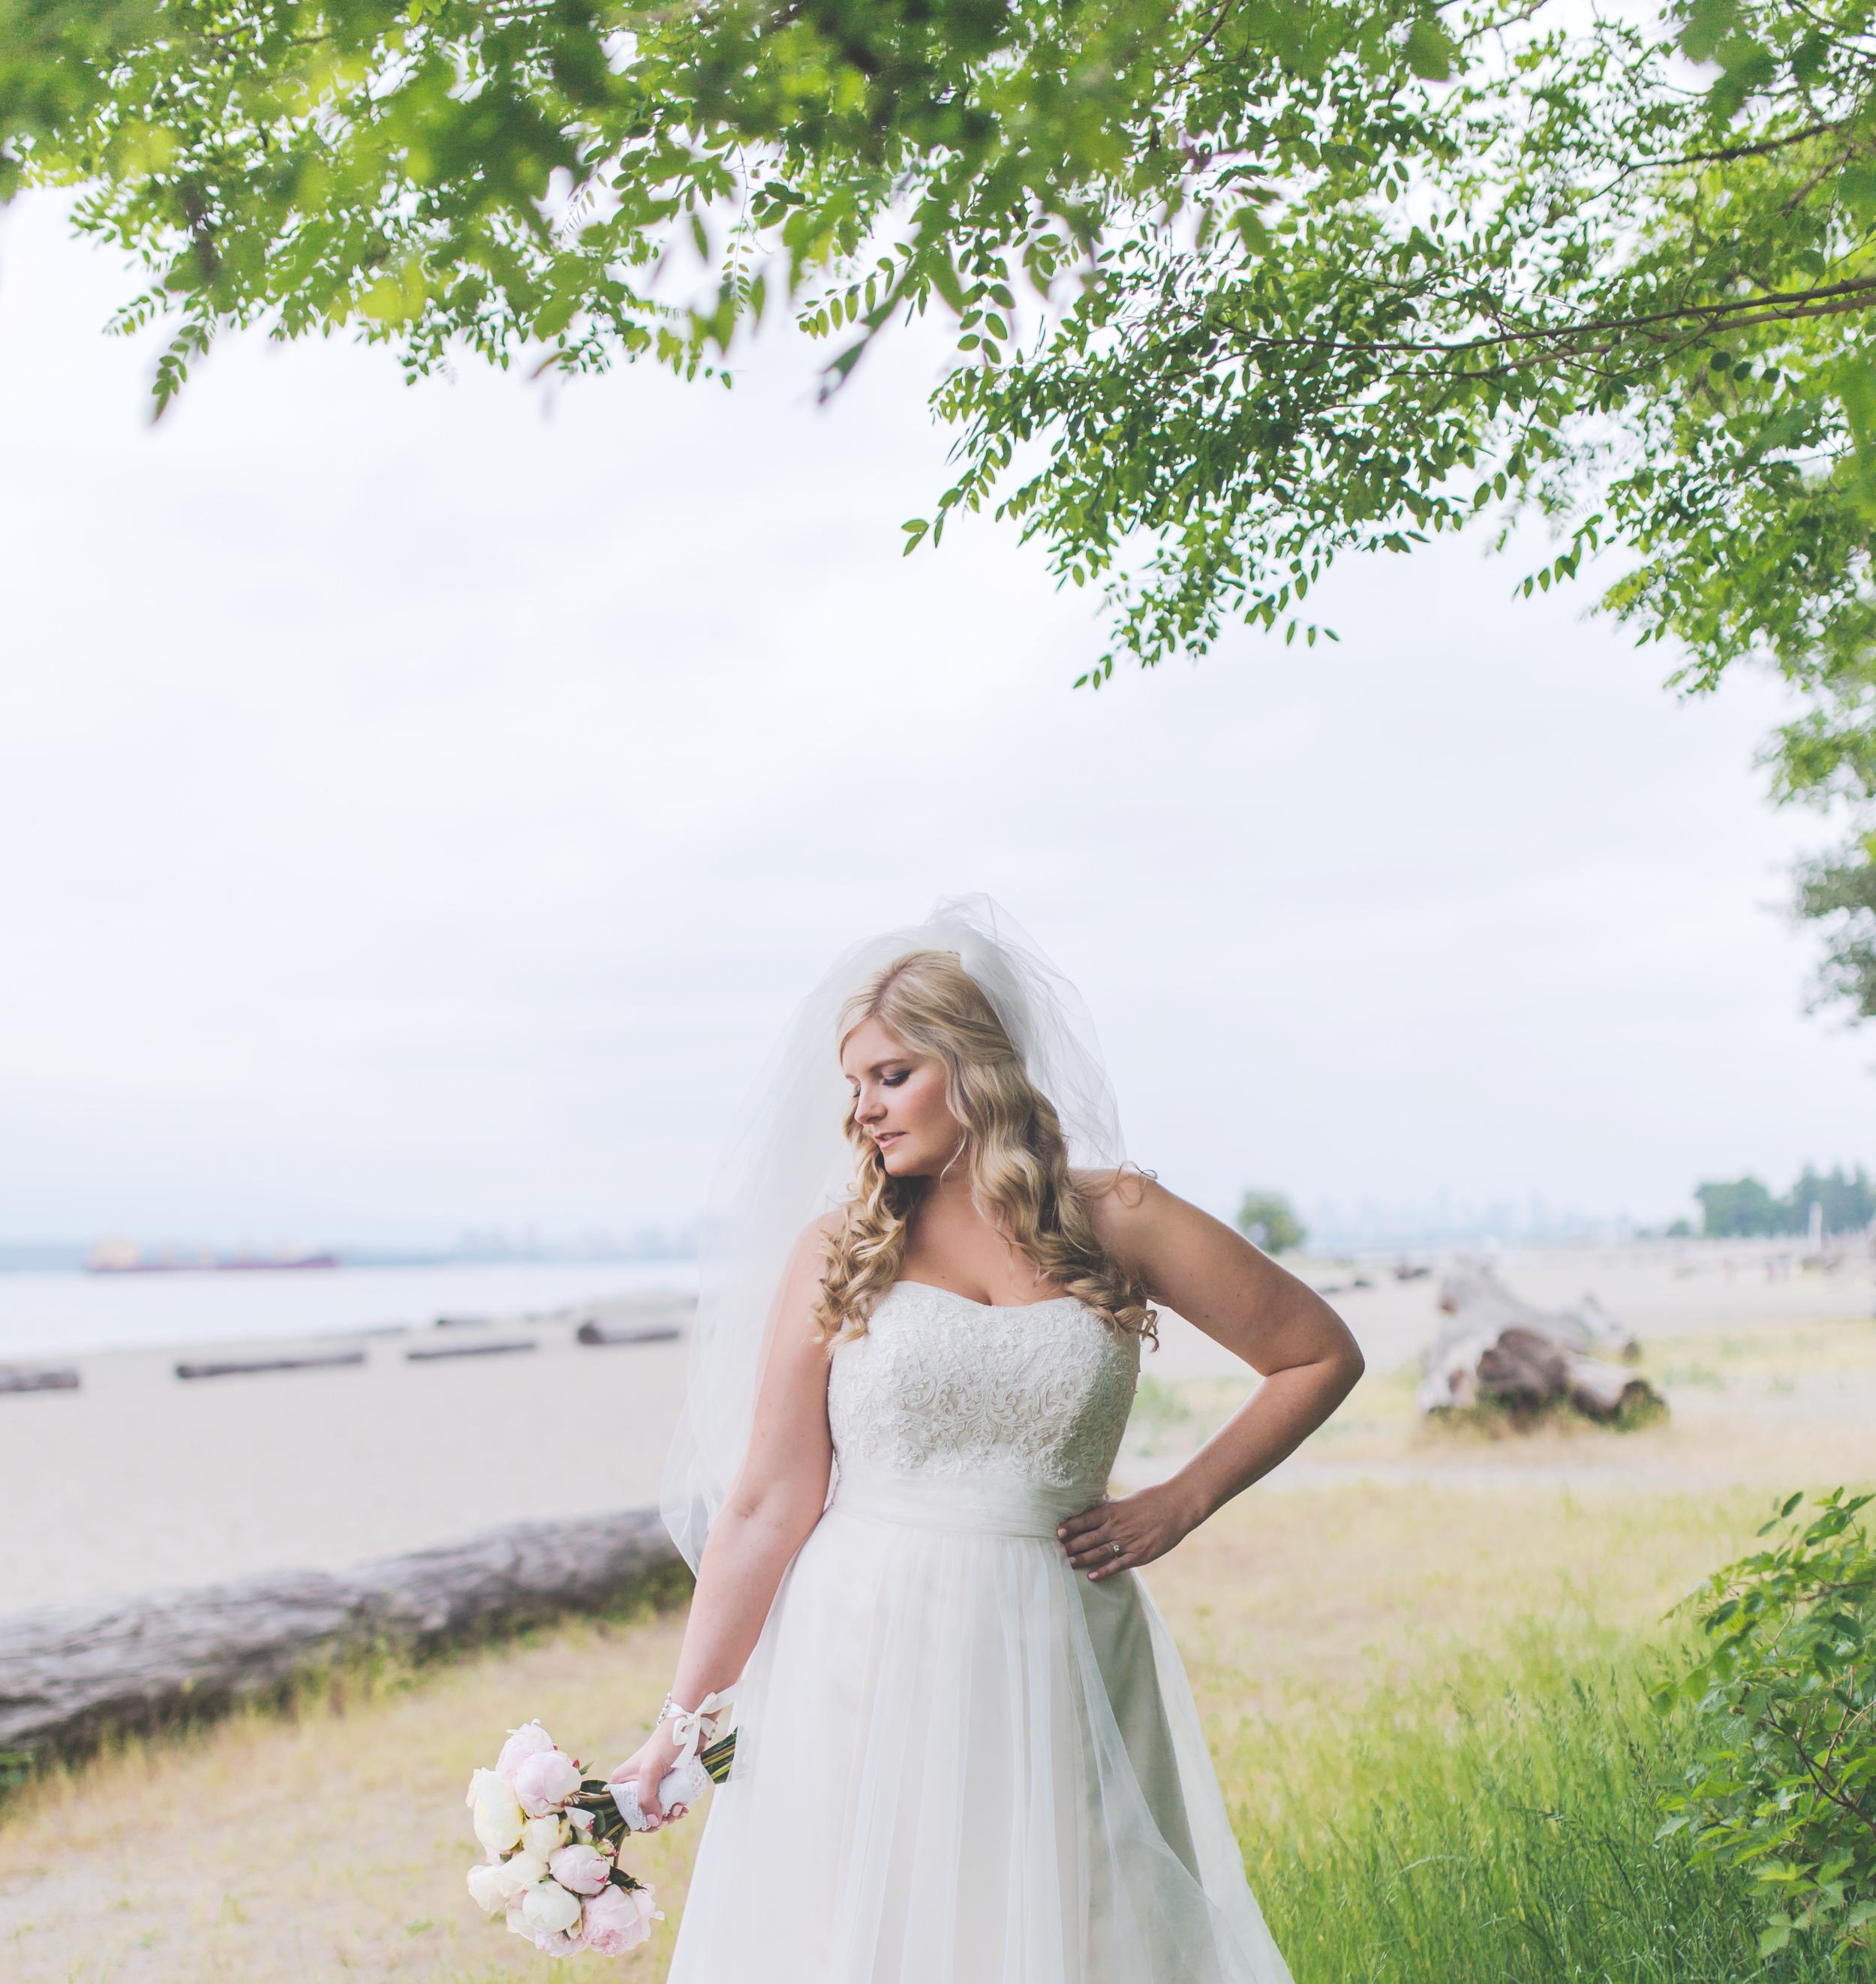 IMG_4965 VANCOUVER WEDDING PHOTOGRAPHER JENNIFER PICARD PHOTOGRAPHY.jpg